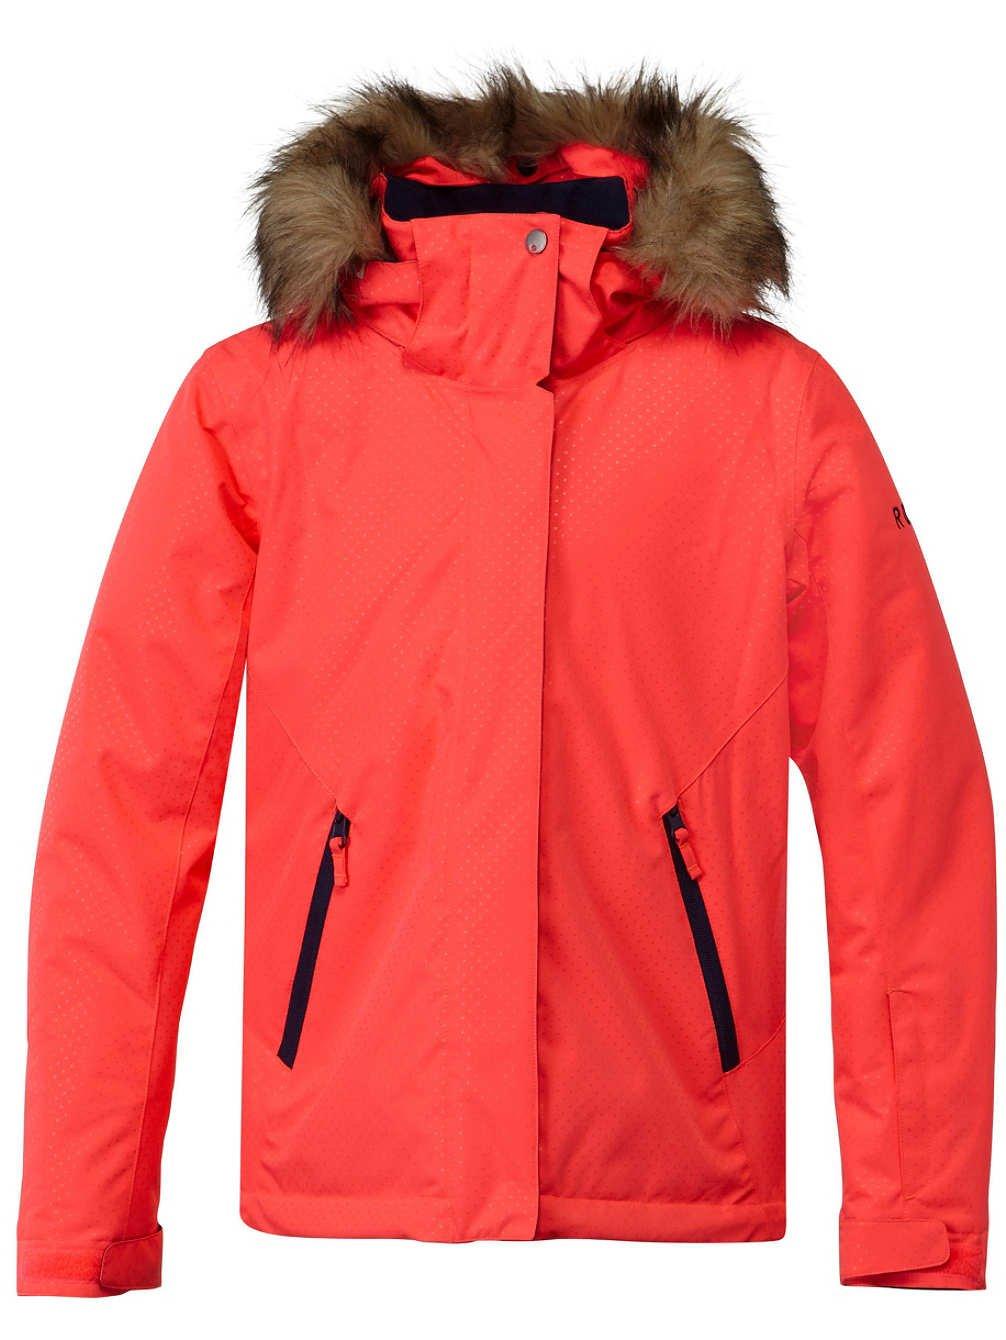 Roxy Mädchen Snowboard Jacke Jetski GL EB Jacket online bestellen